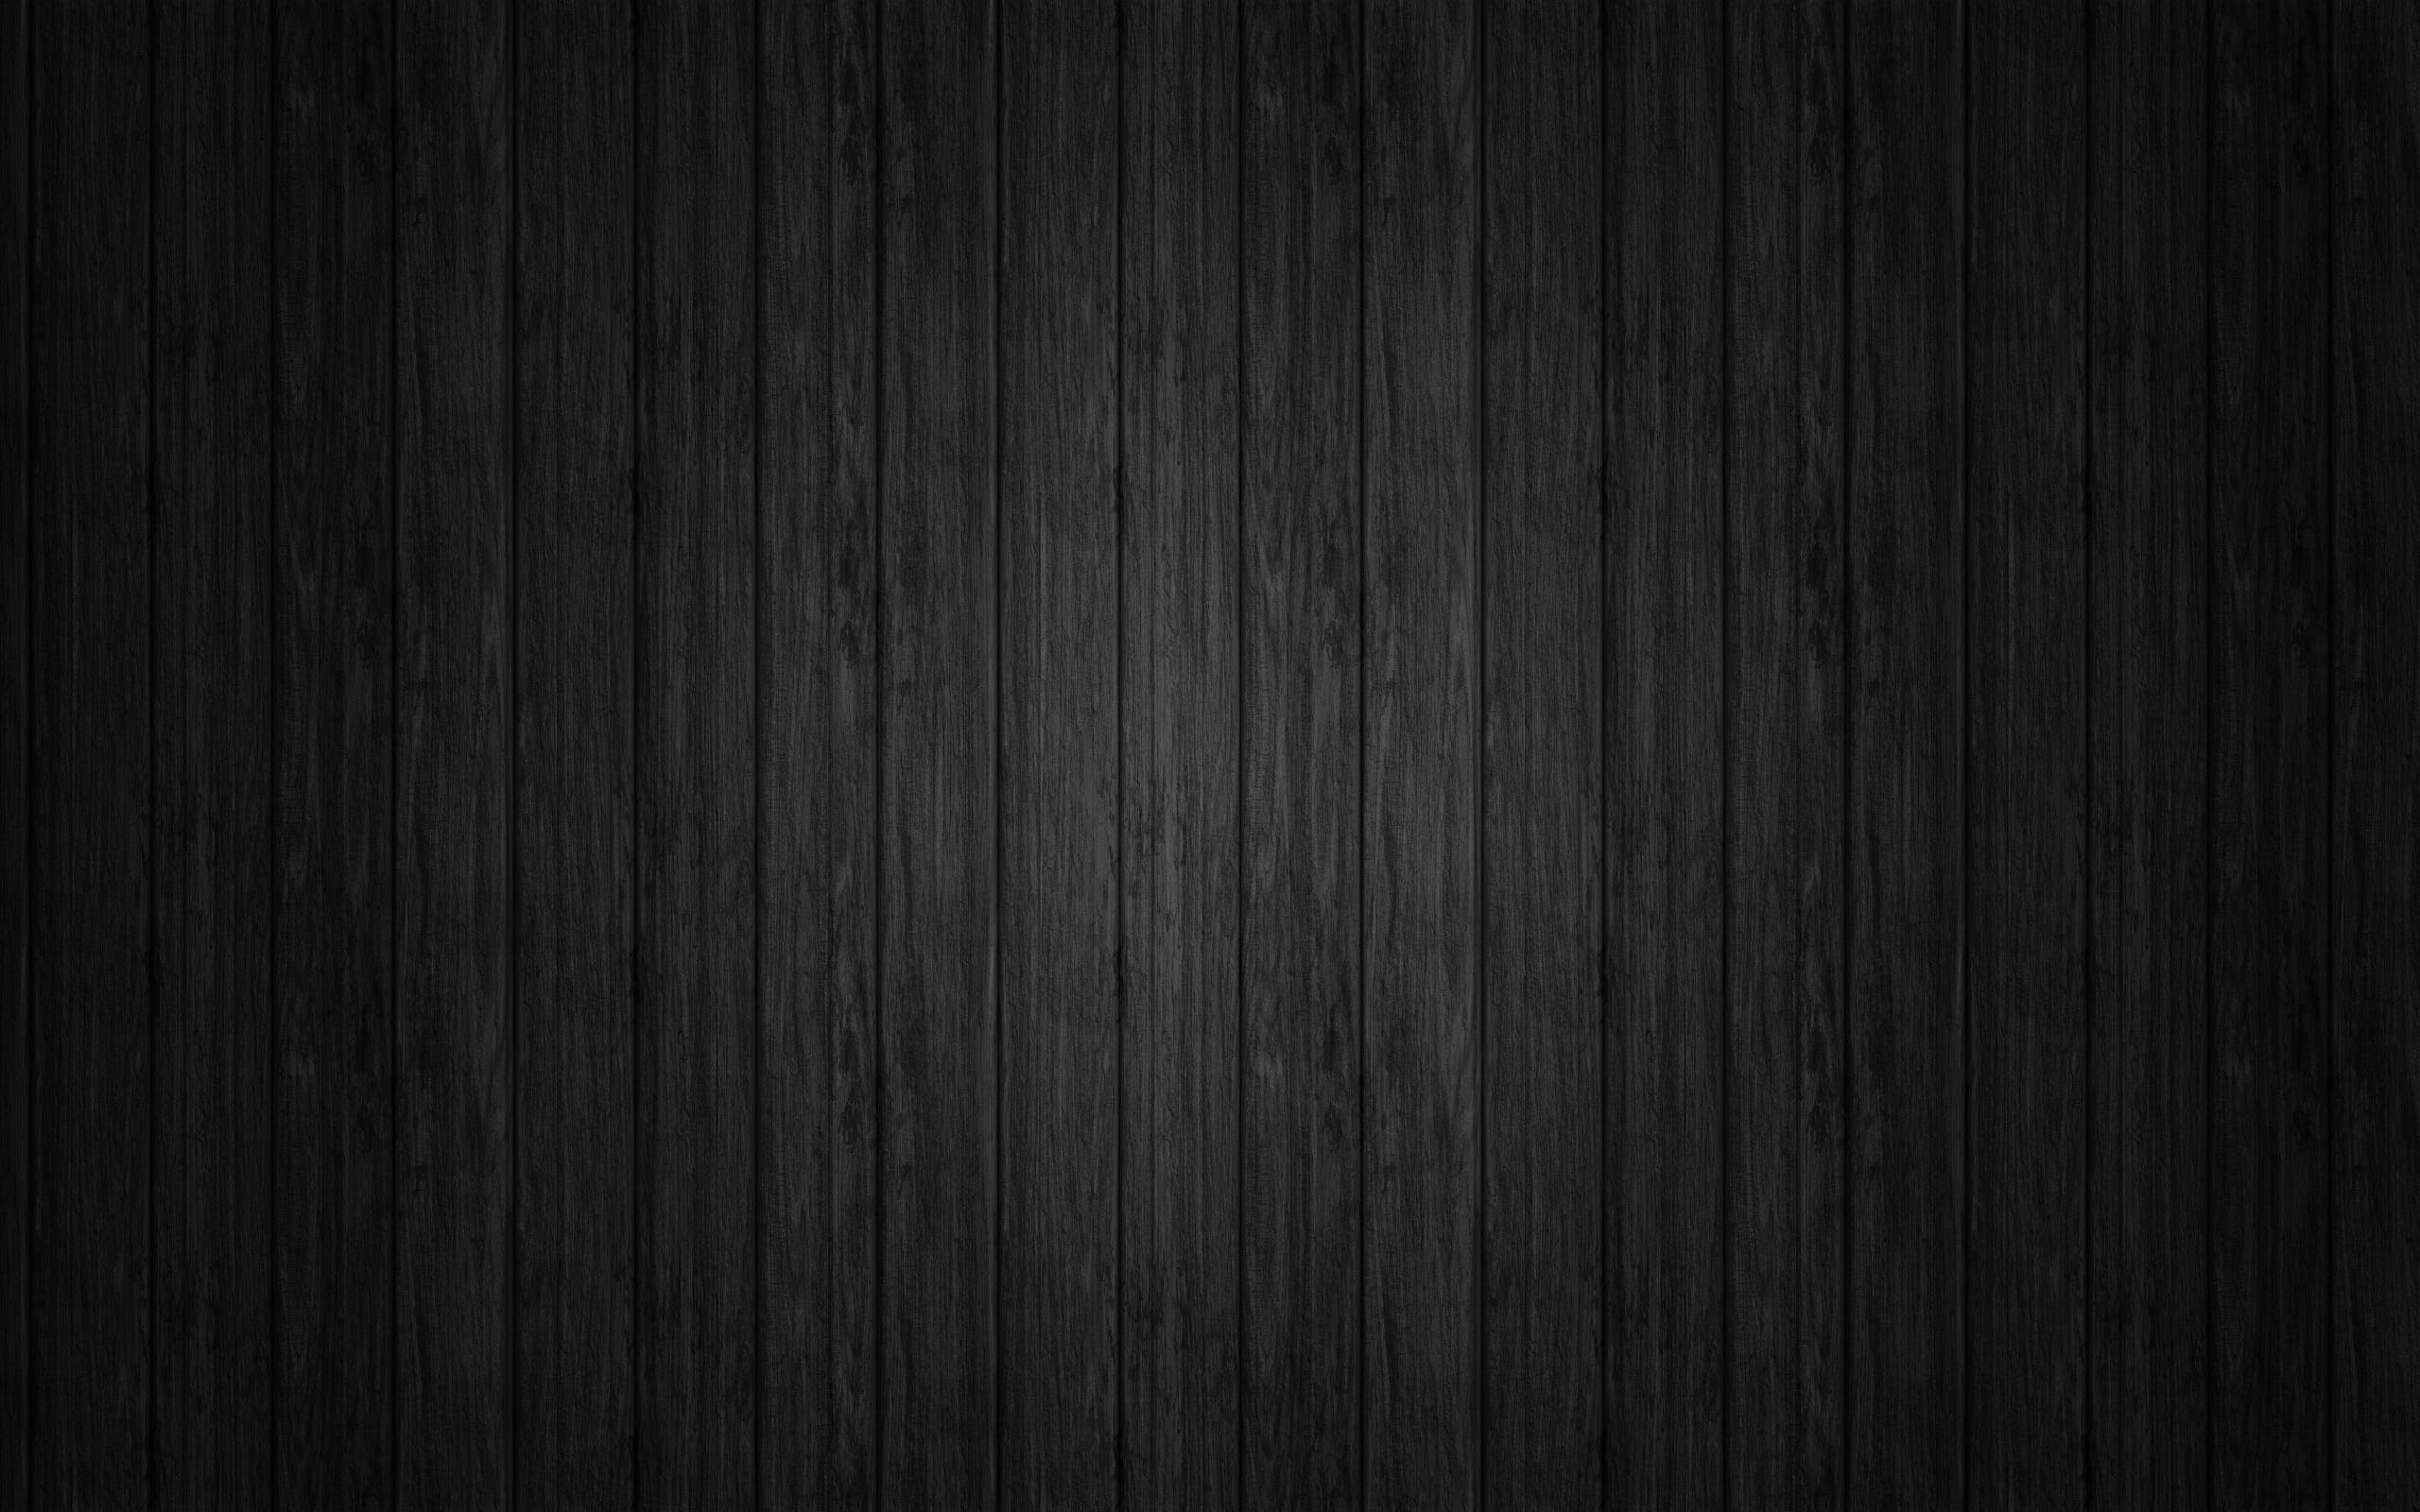 black background wallpaper 2560x1600 - photo #23